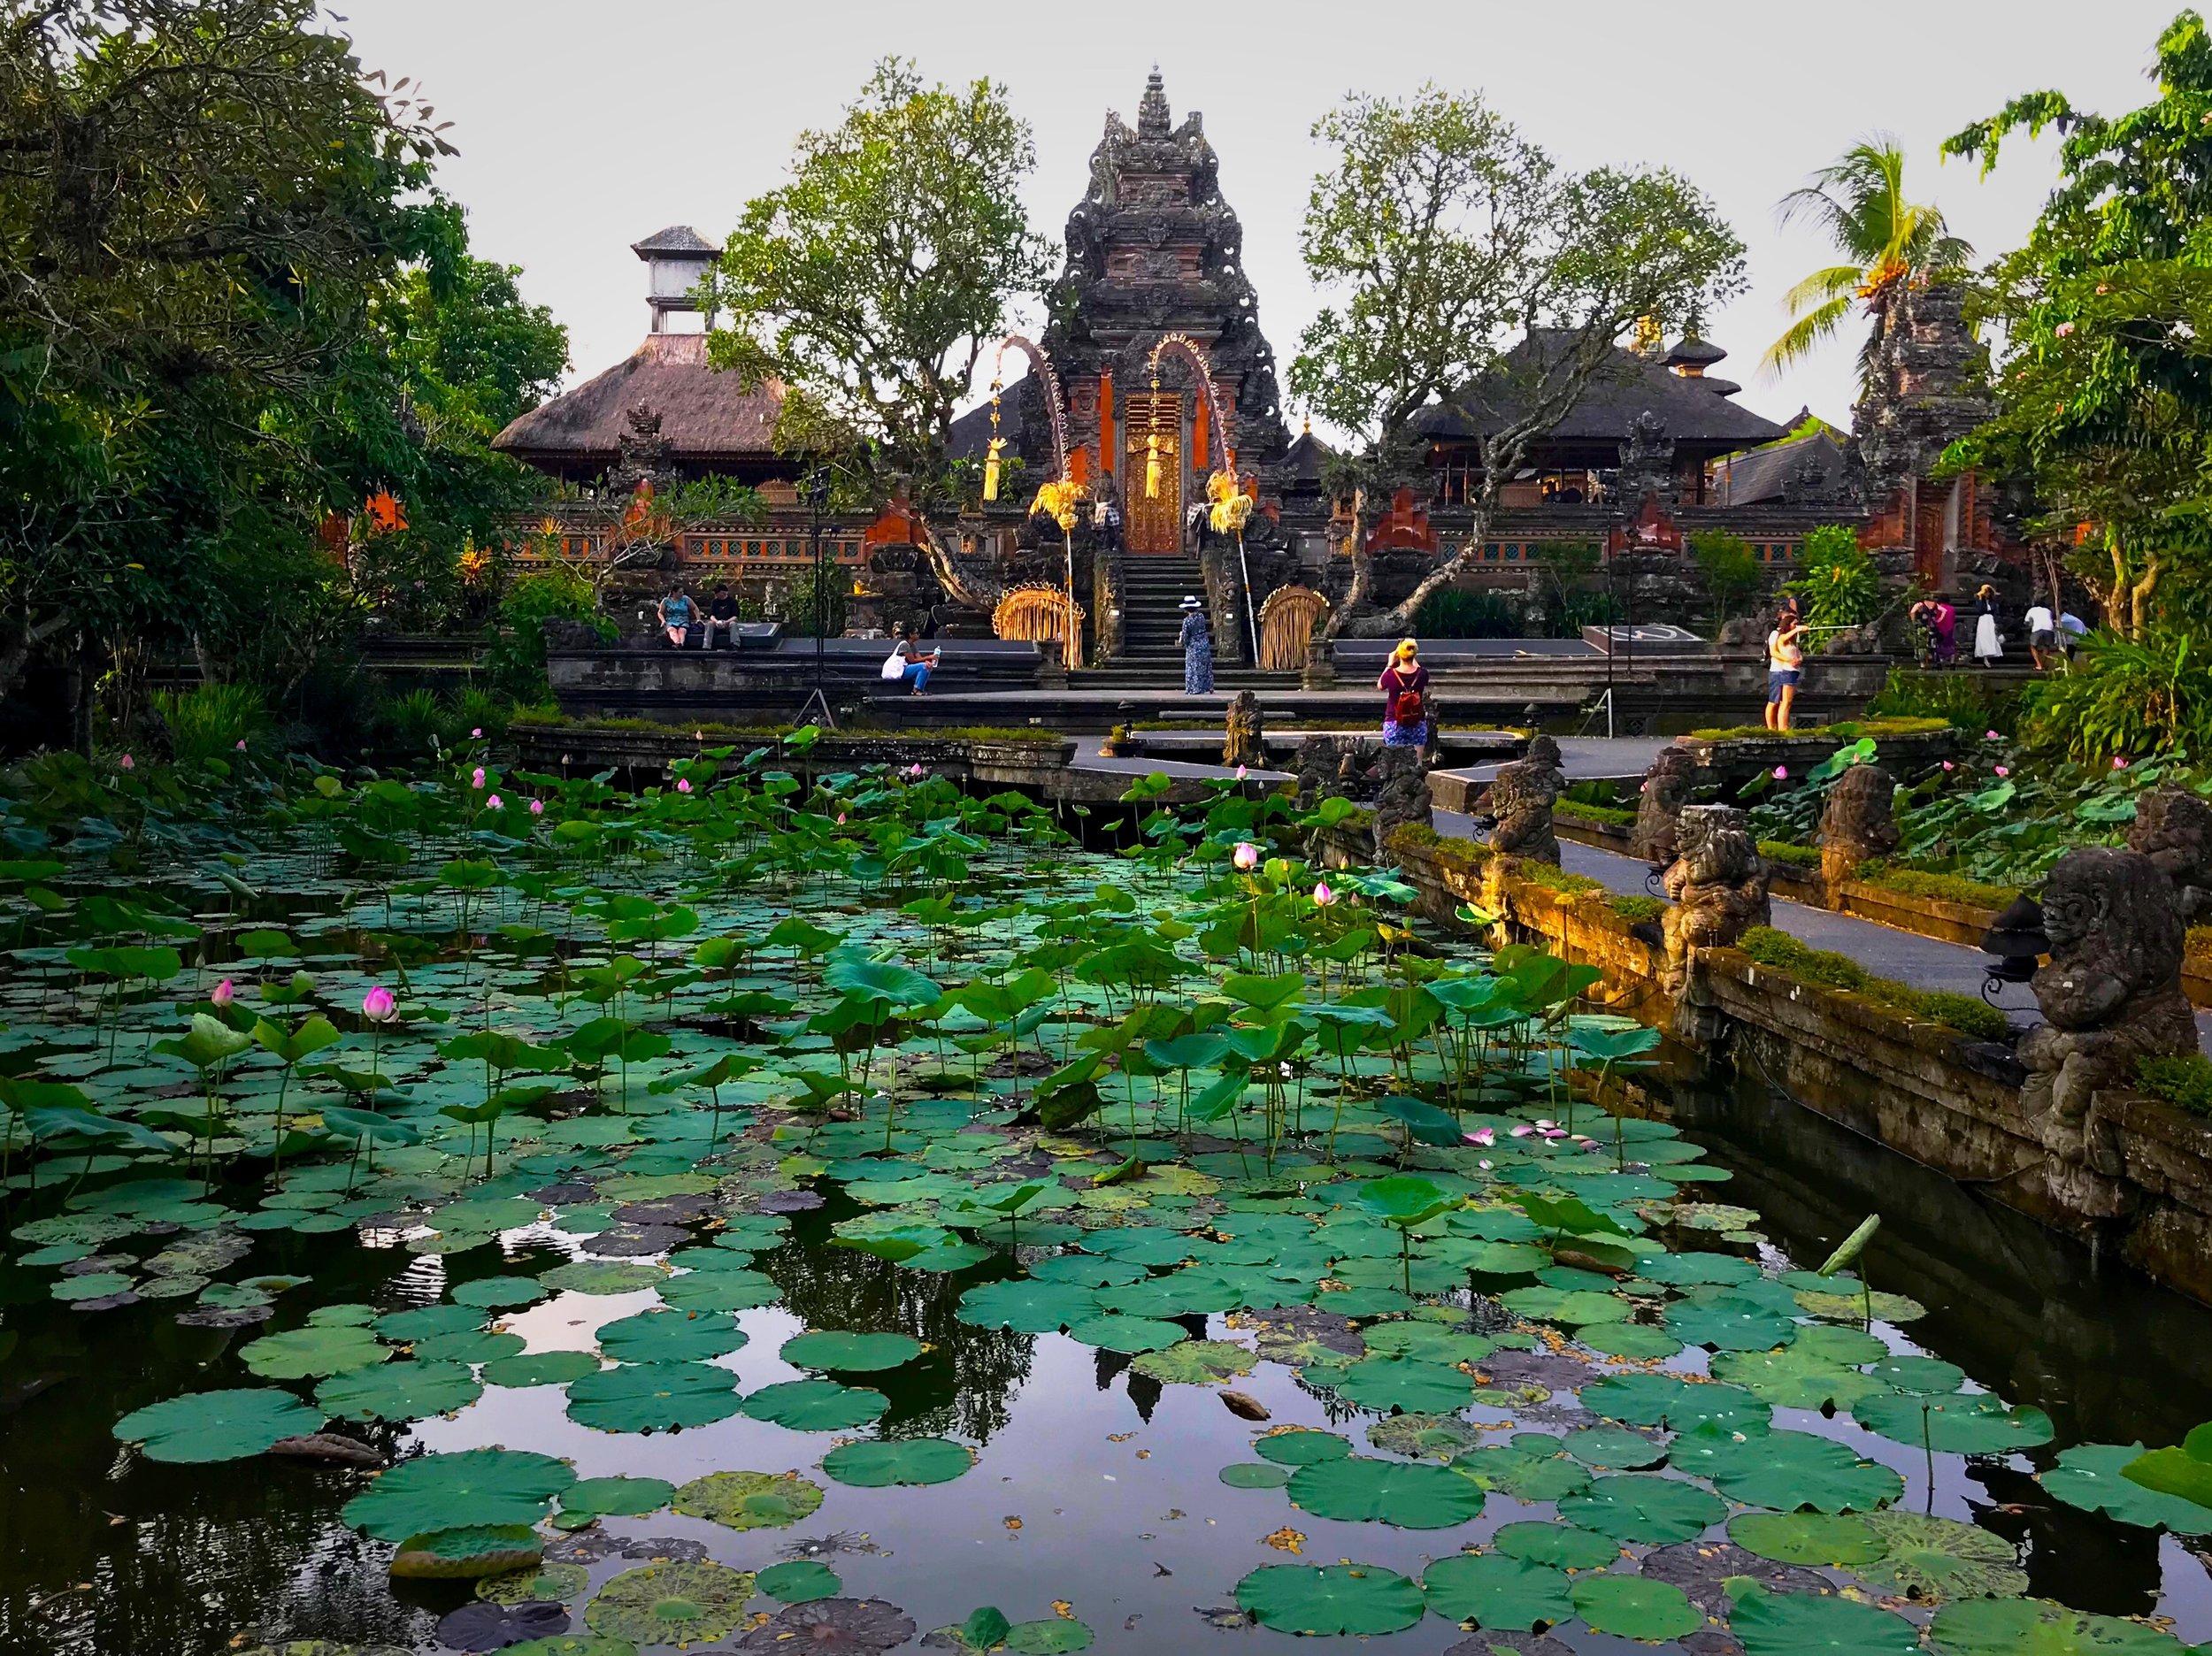 The Saraswati Temple is a peaceful oasis in Ubud